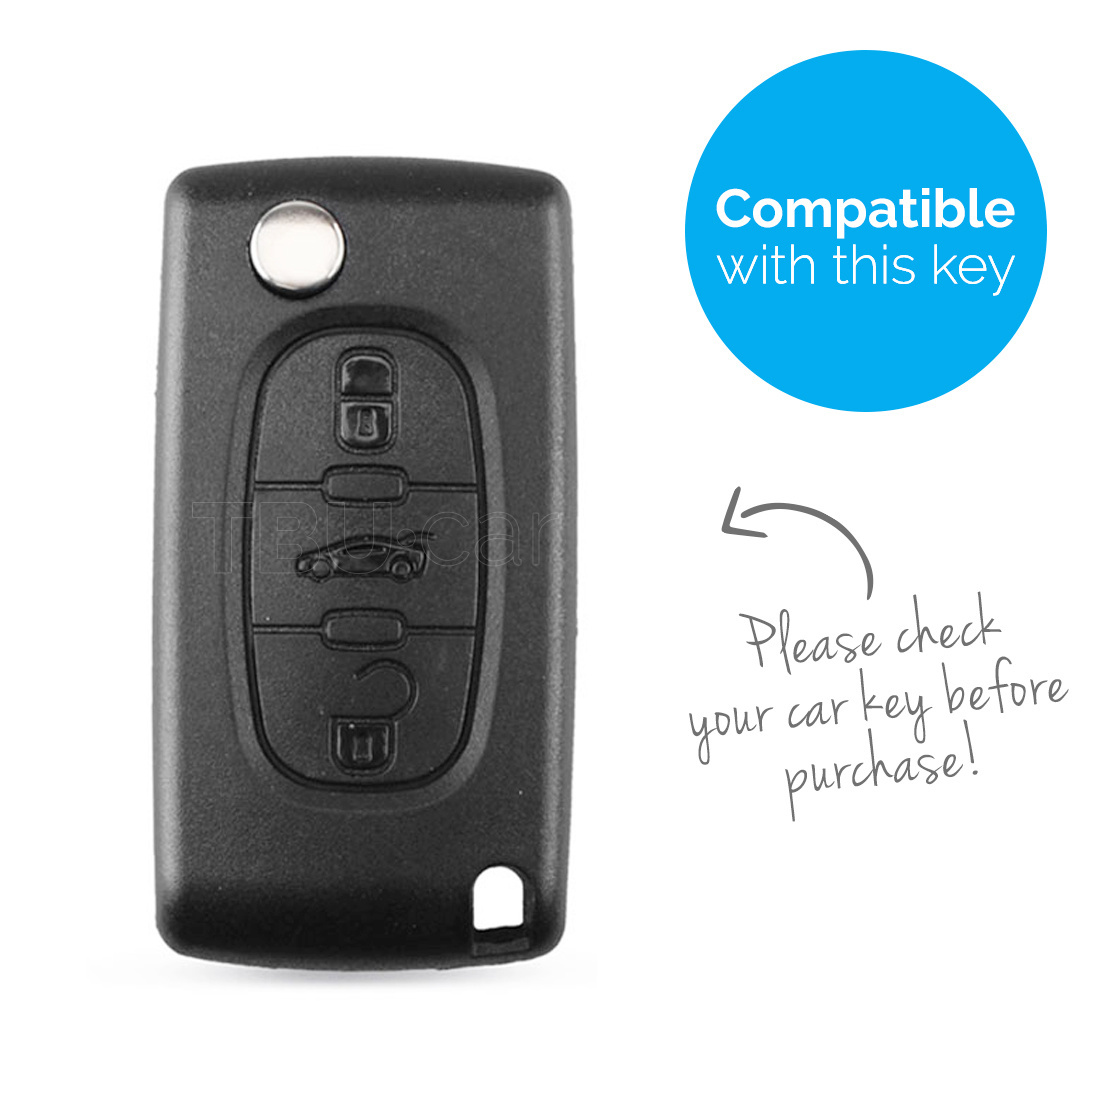 TBU car TBU car Autoschlüssel Hülle kompatibel mit Fiat 3 Tasten - Schutzhülle aus Silikon - Auto Schlüsselhülle Cover in Weiß